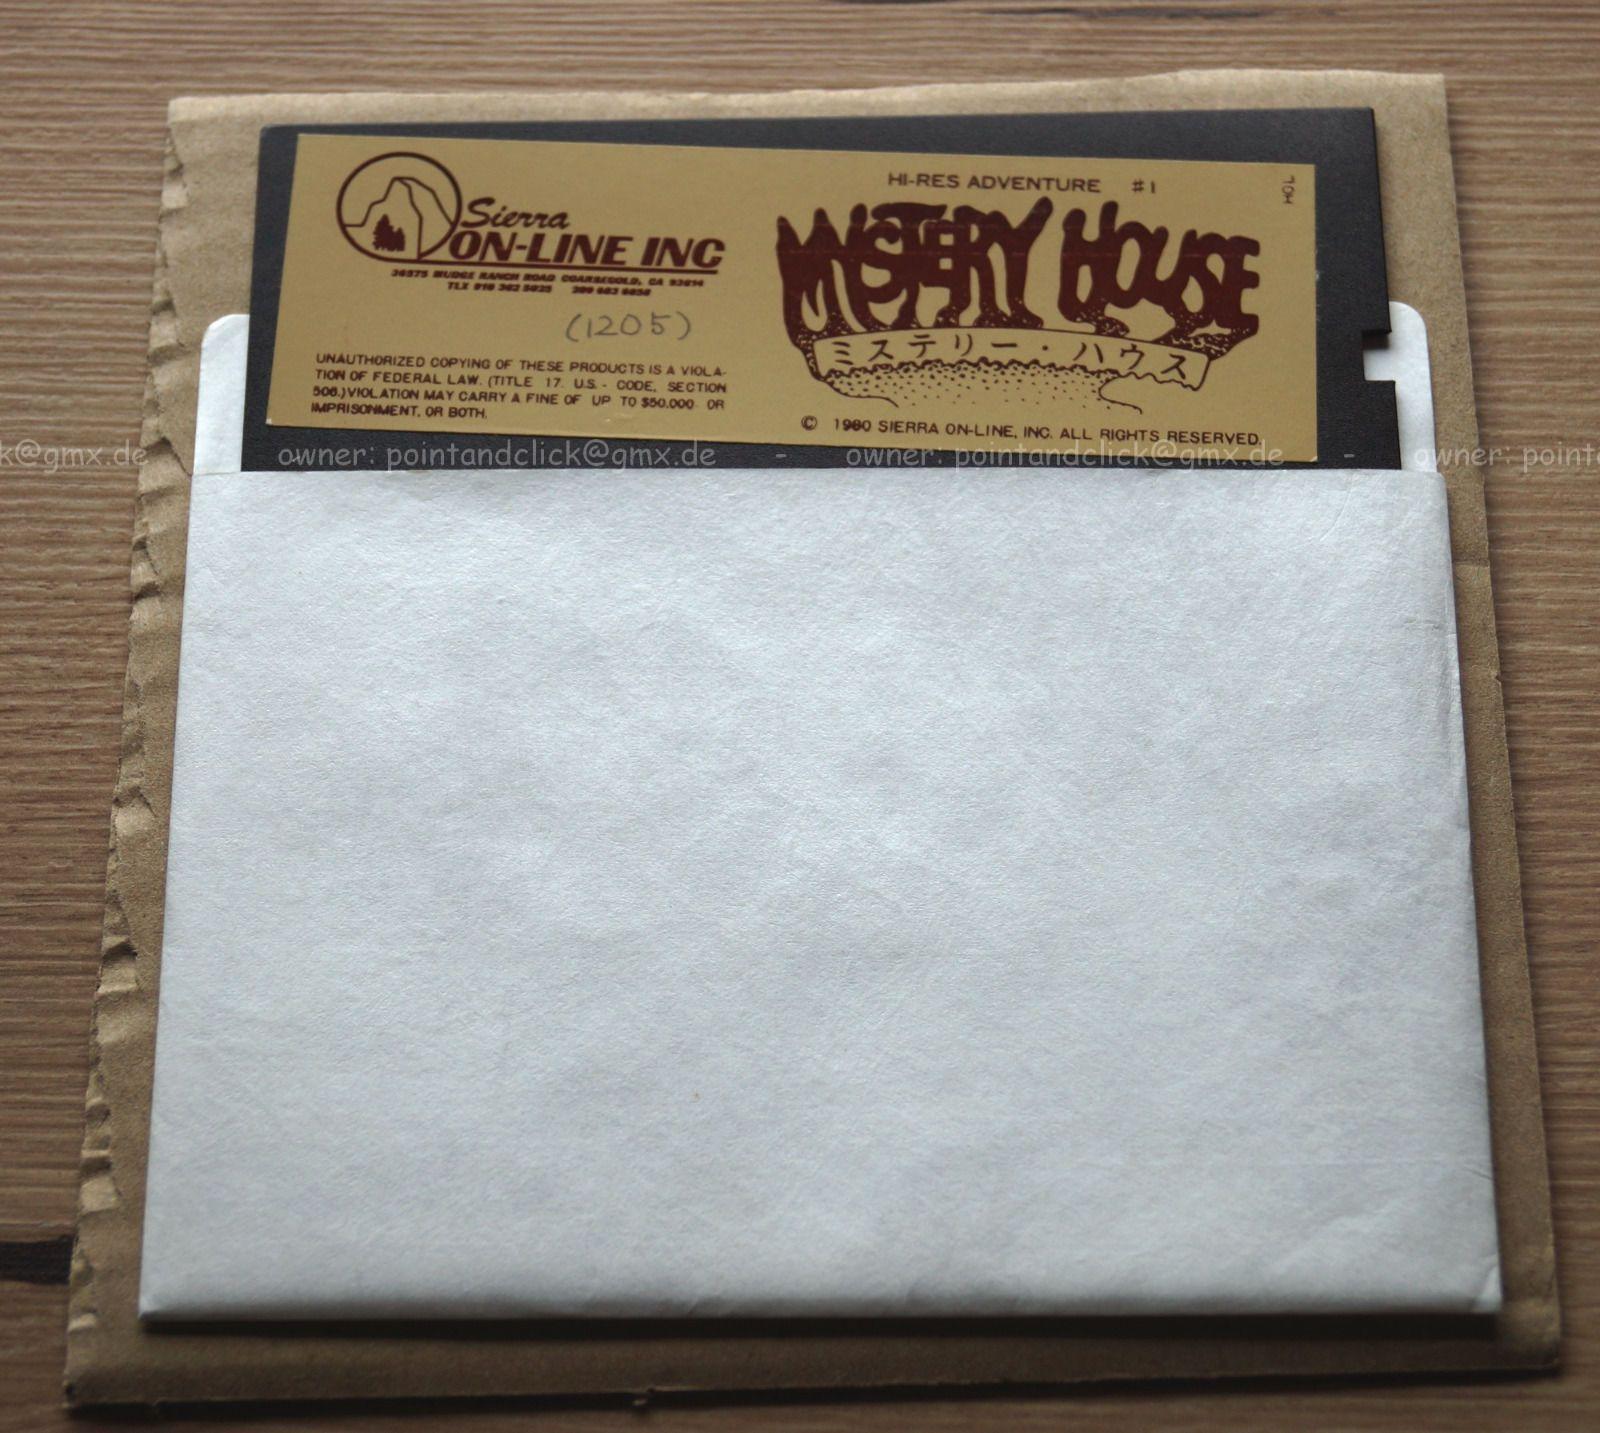 Sierra OnLine Mystery House Japanese label for Apple II